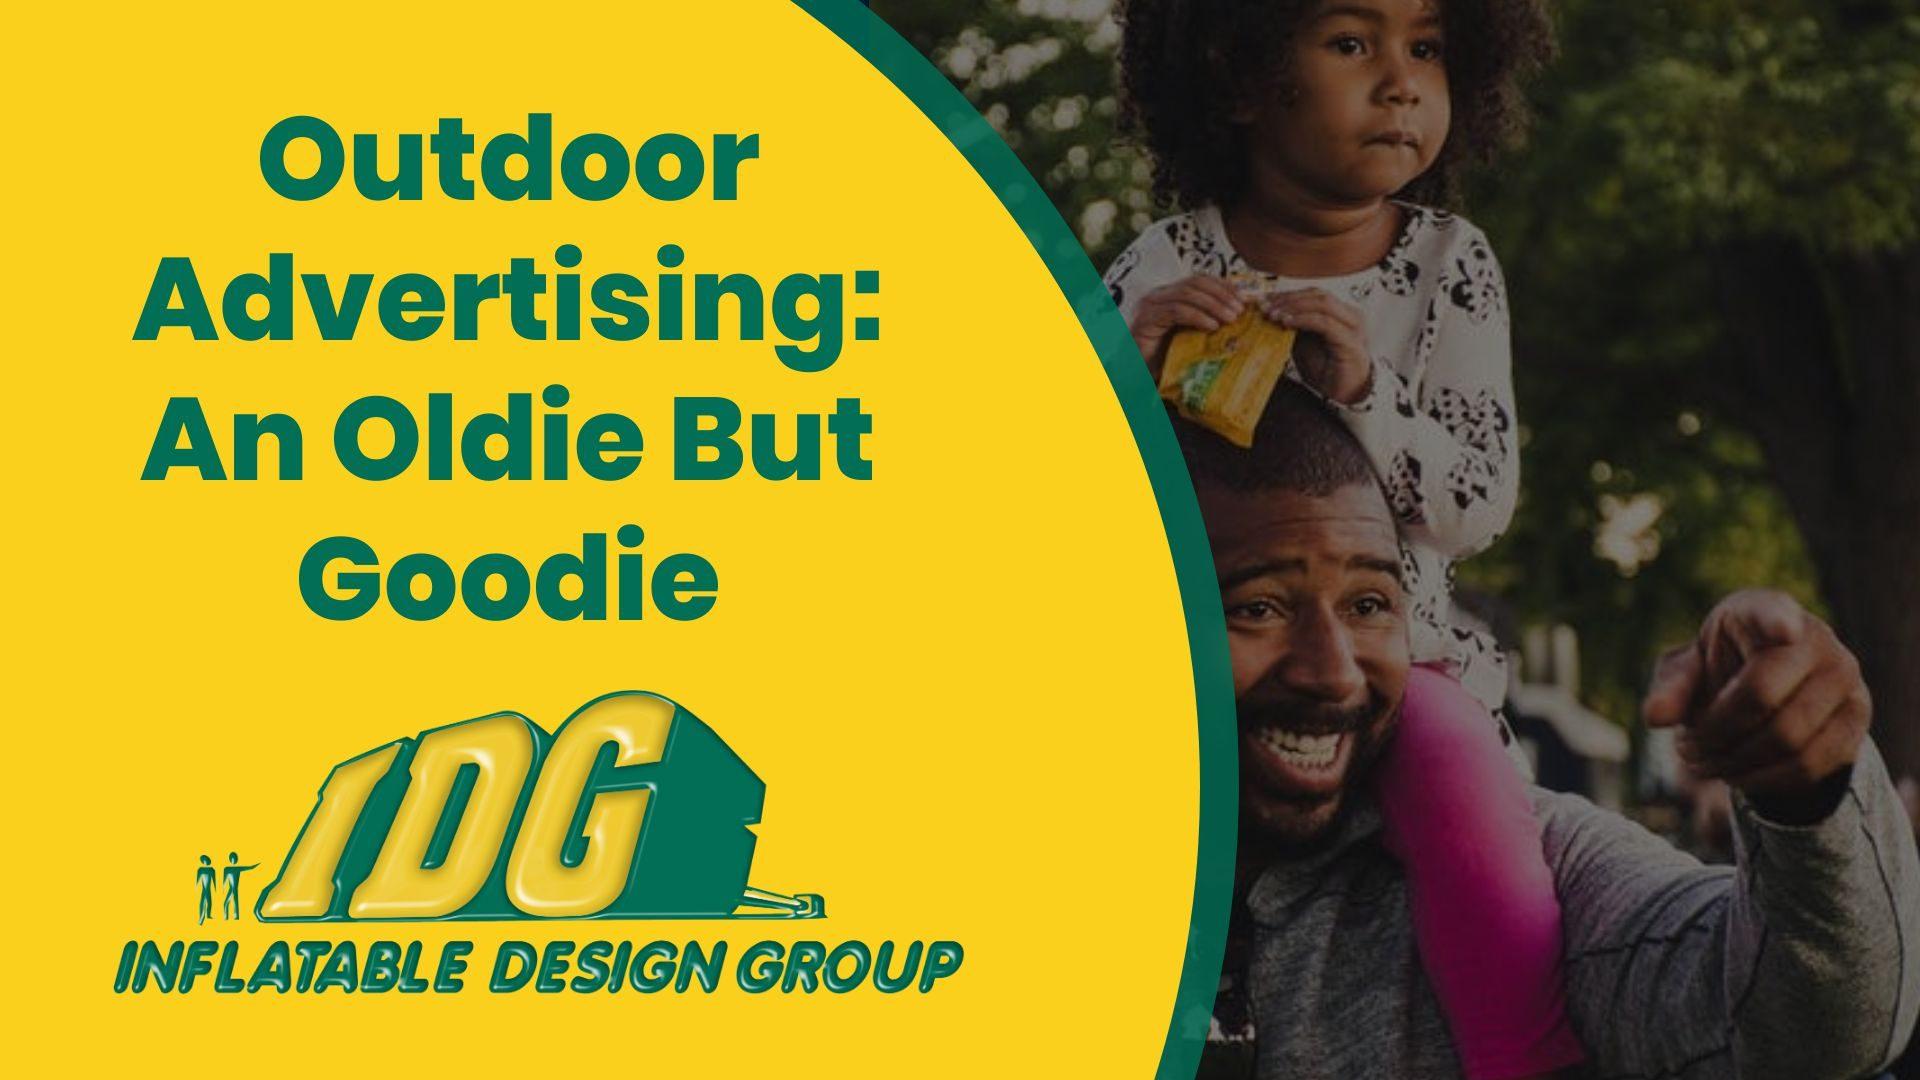 Outdoor Advertising: An Oldie But Goodie